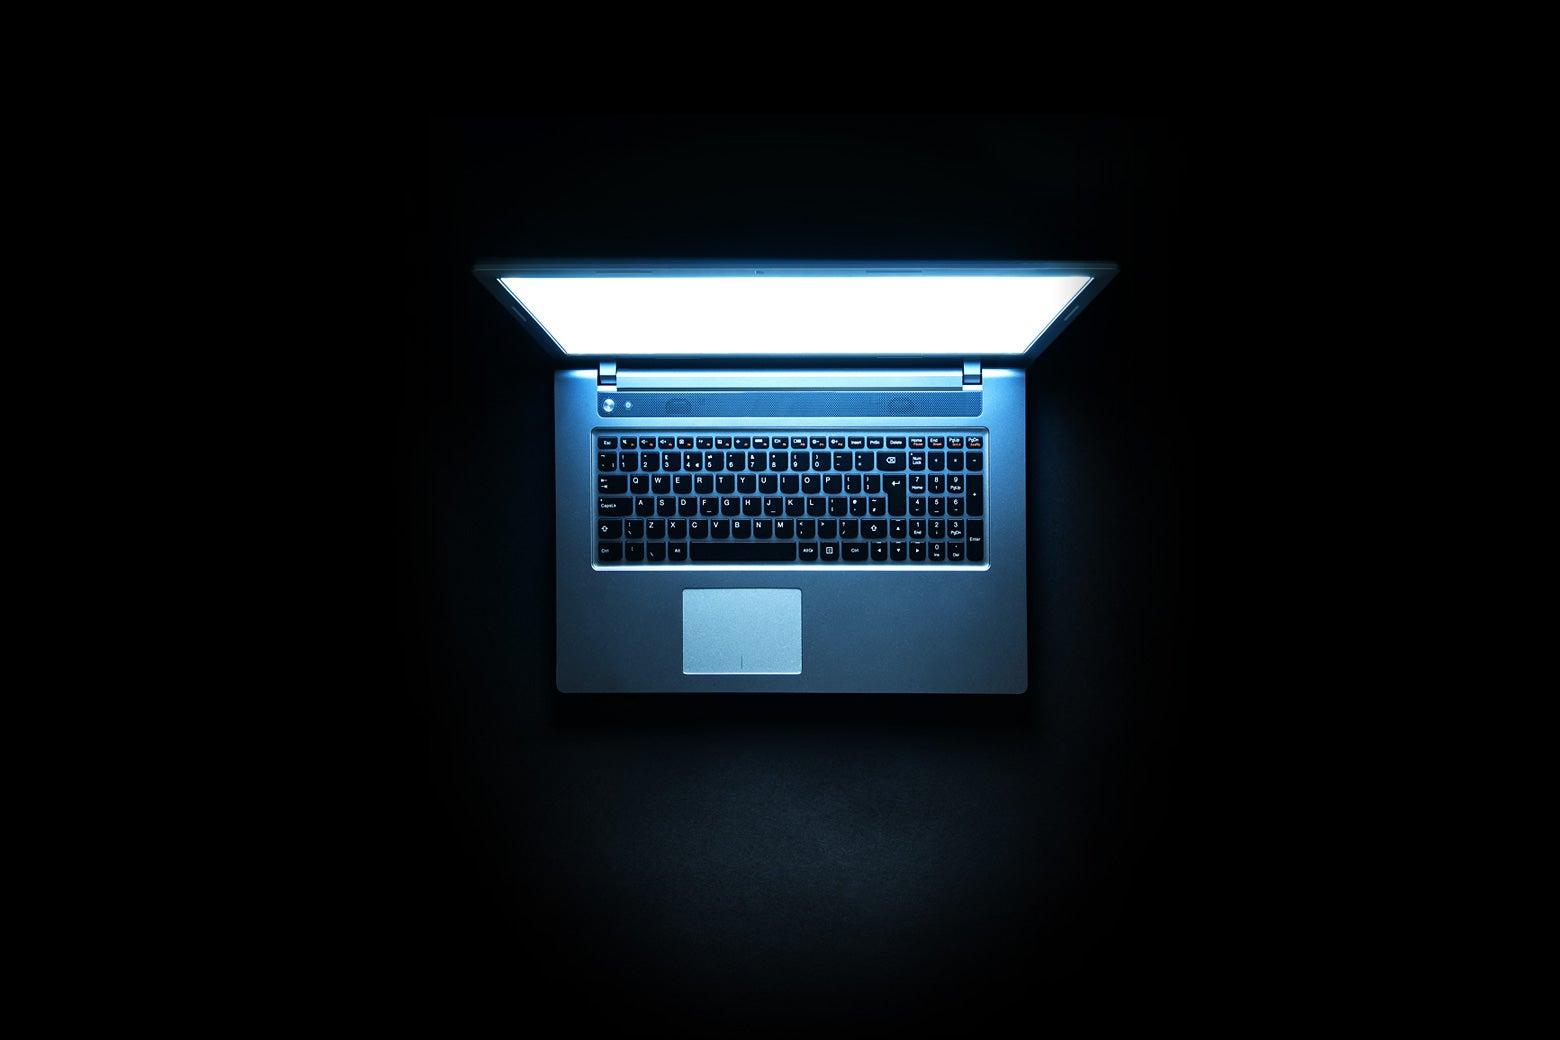 A laptop glowing in a dark room.